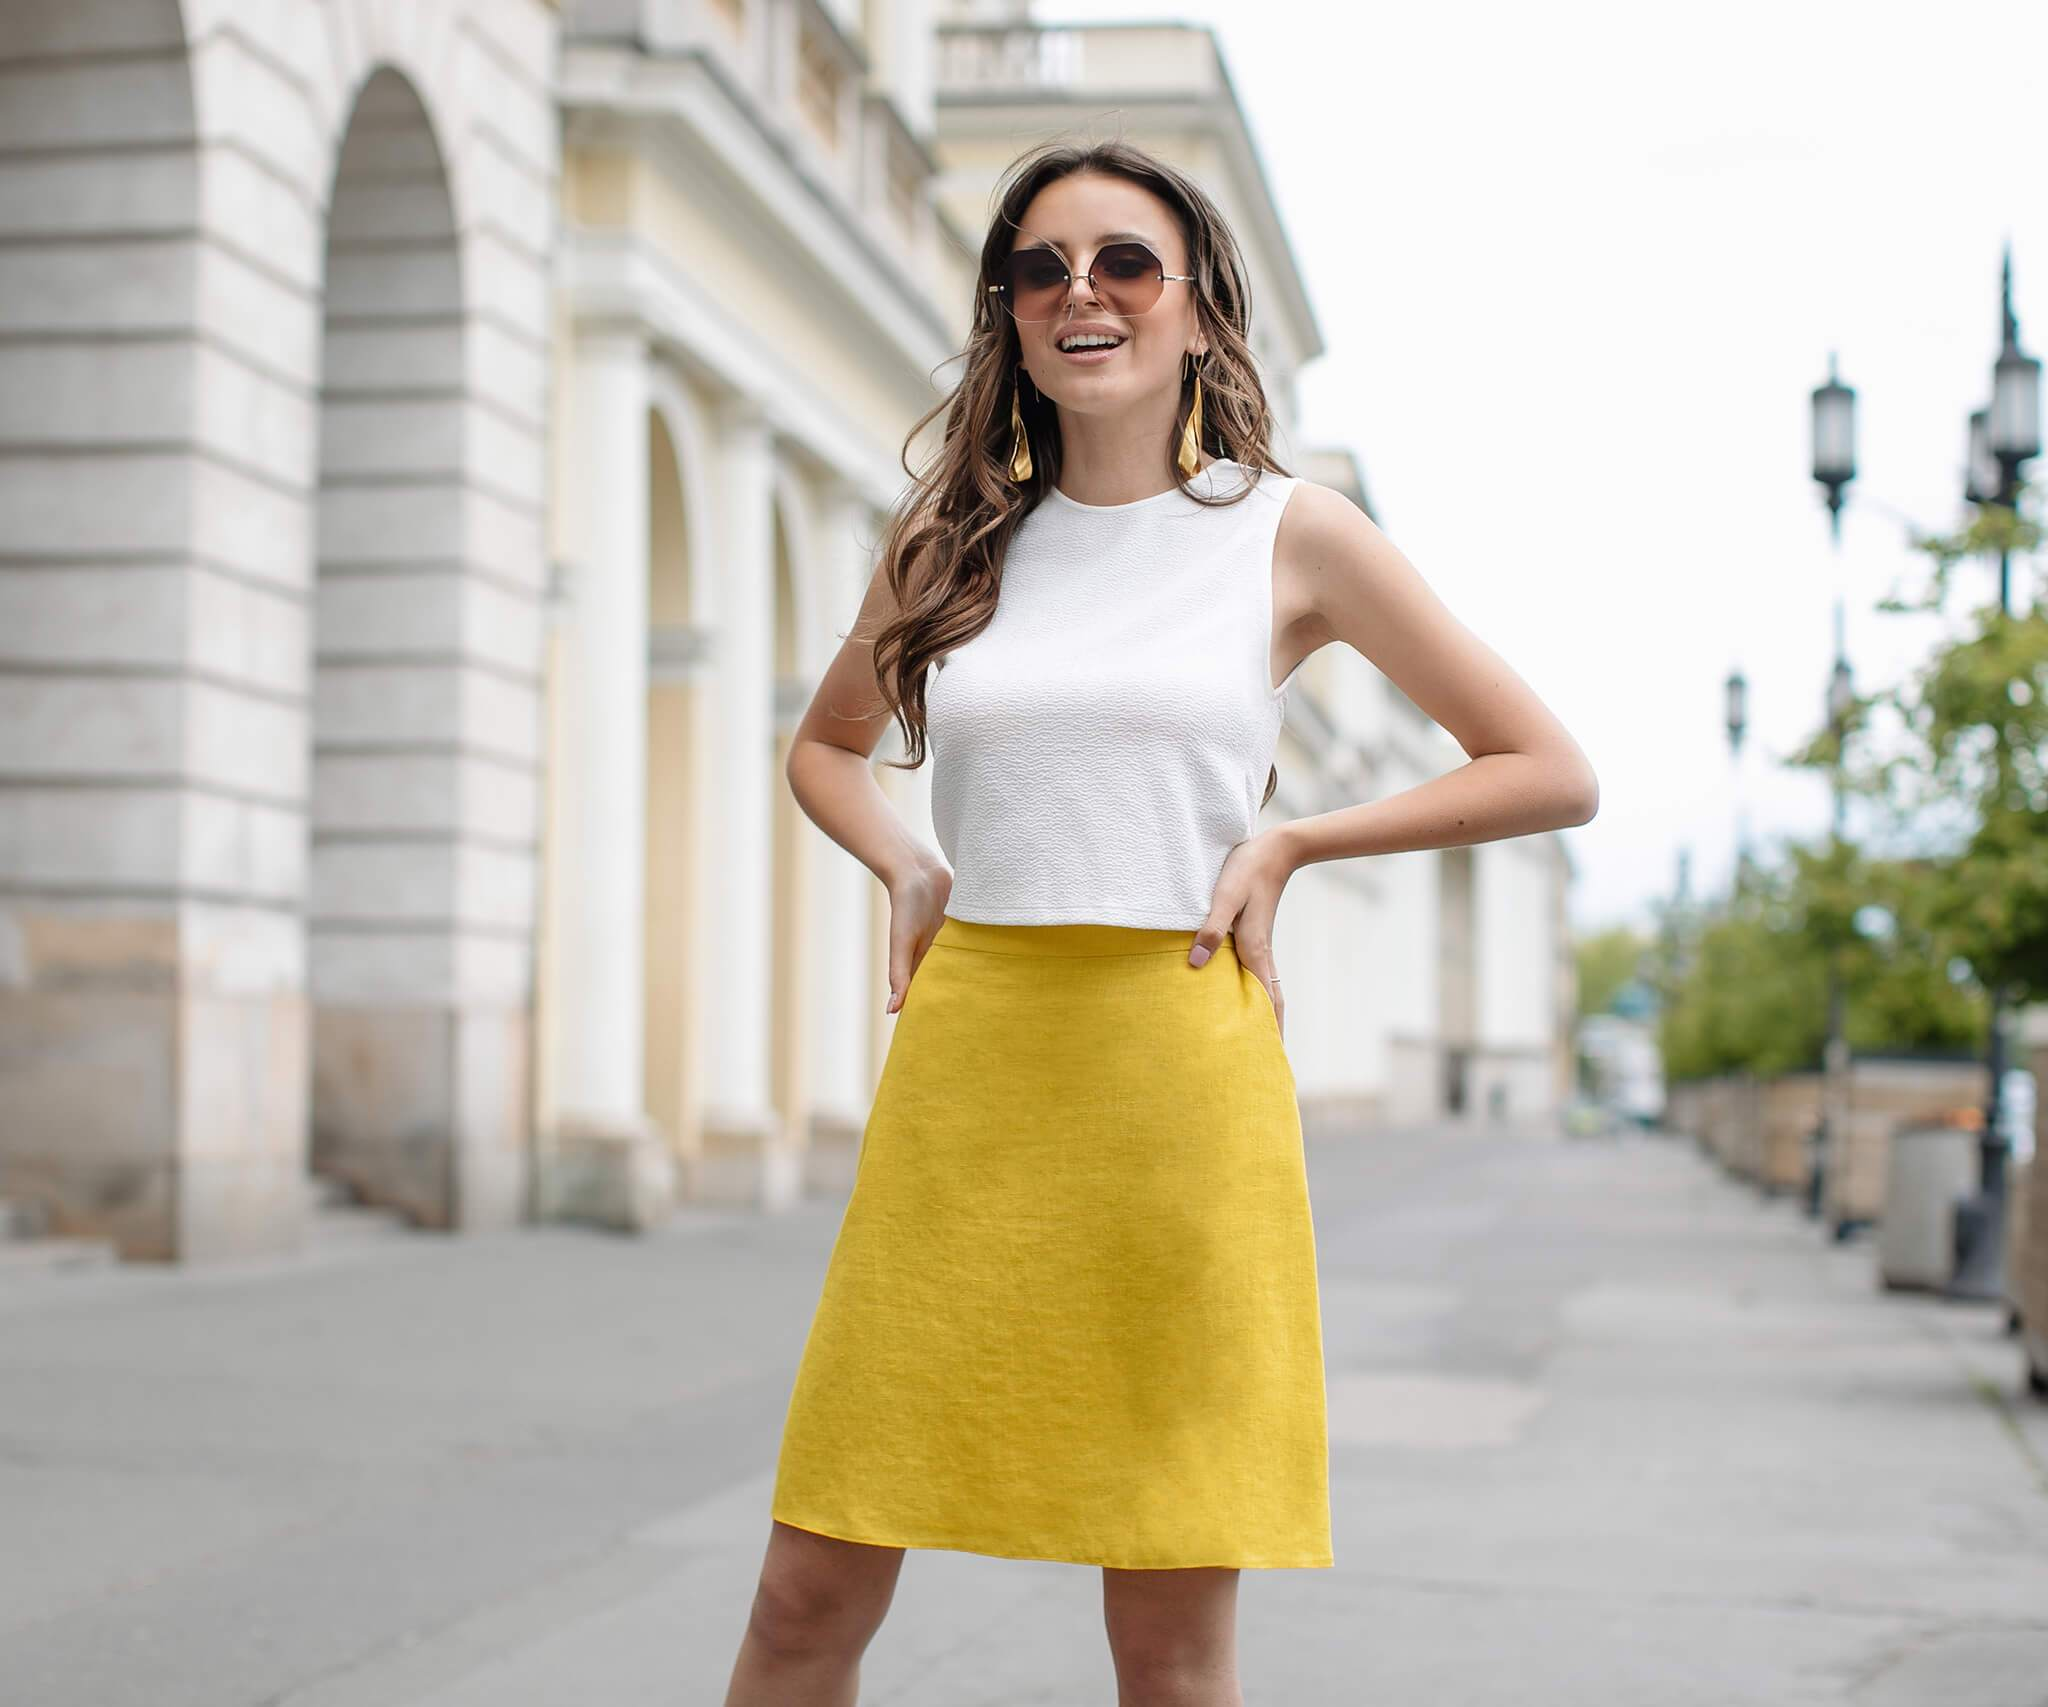 żółta spódnica mini lniana